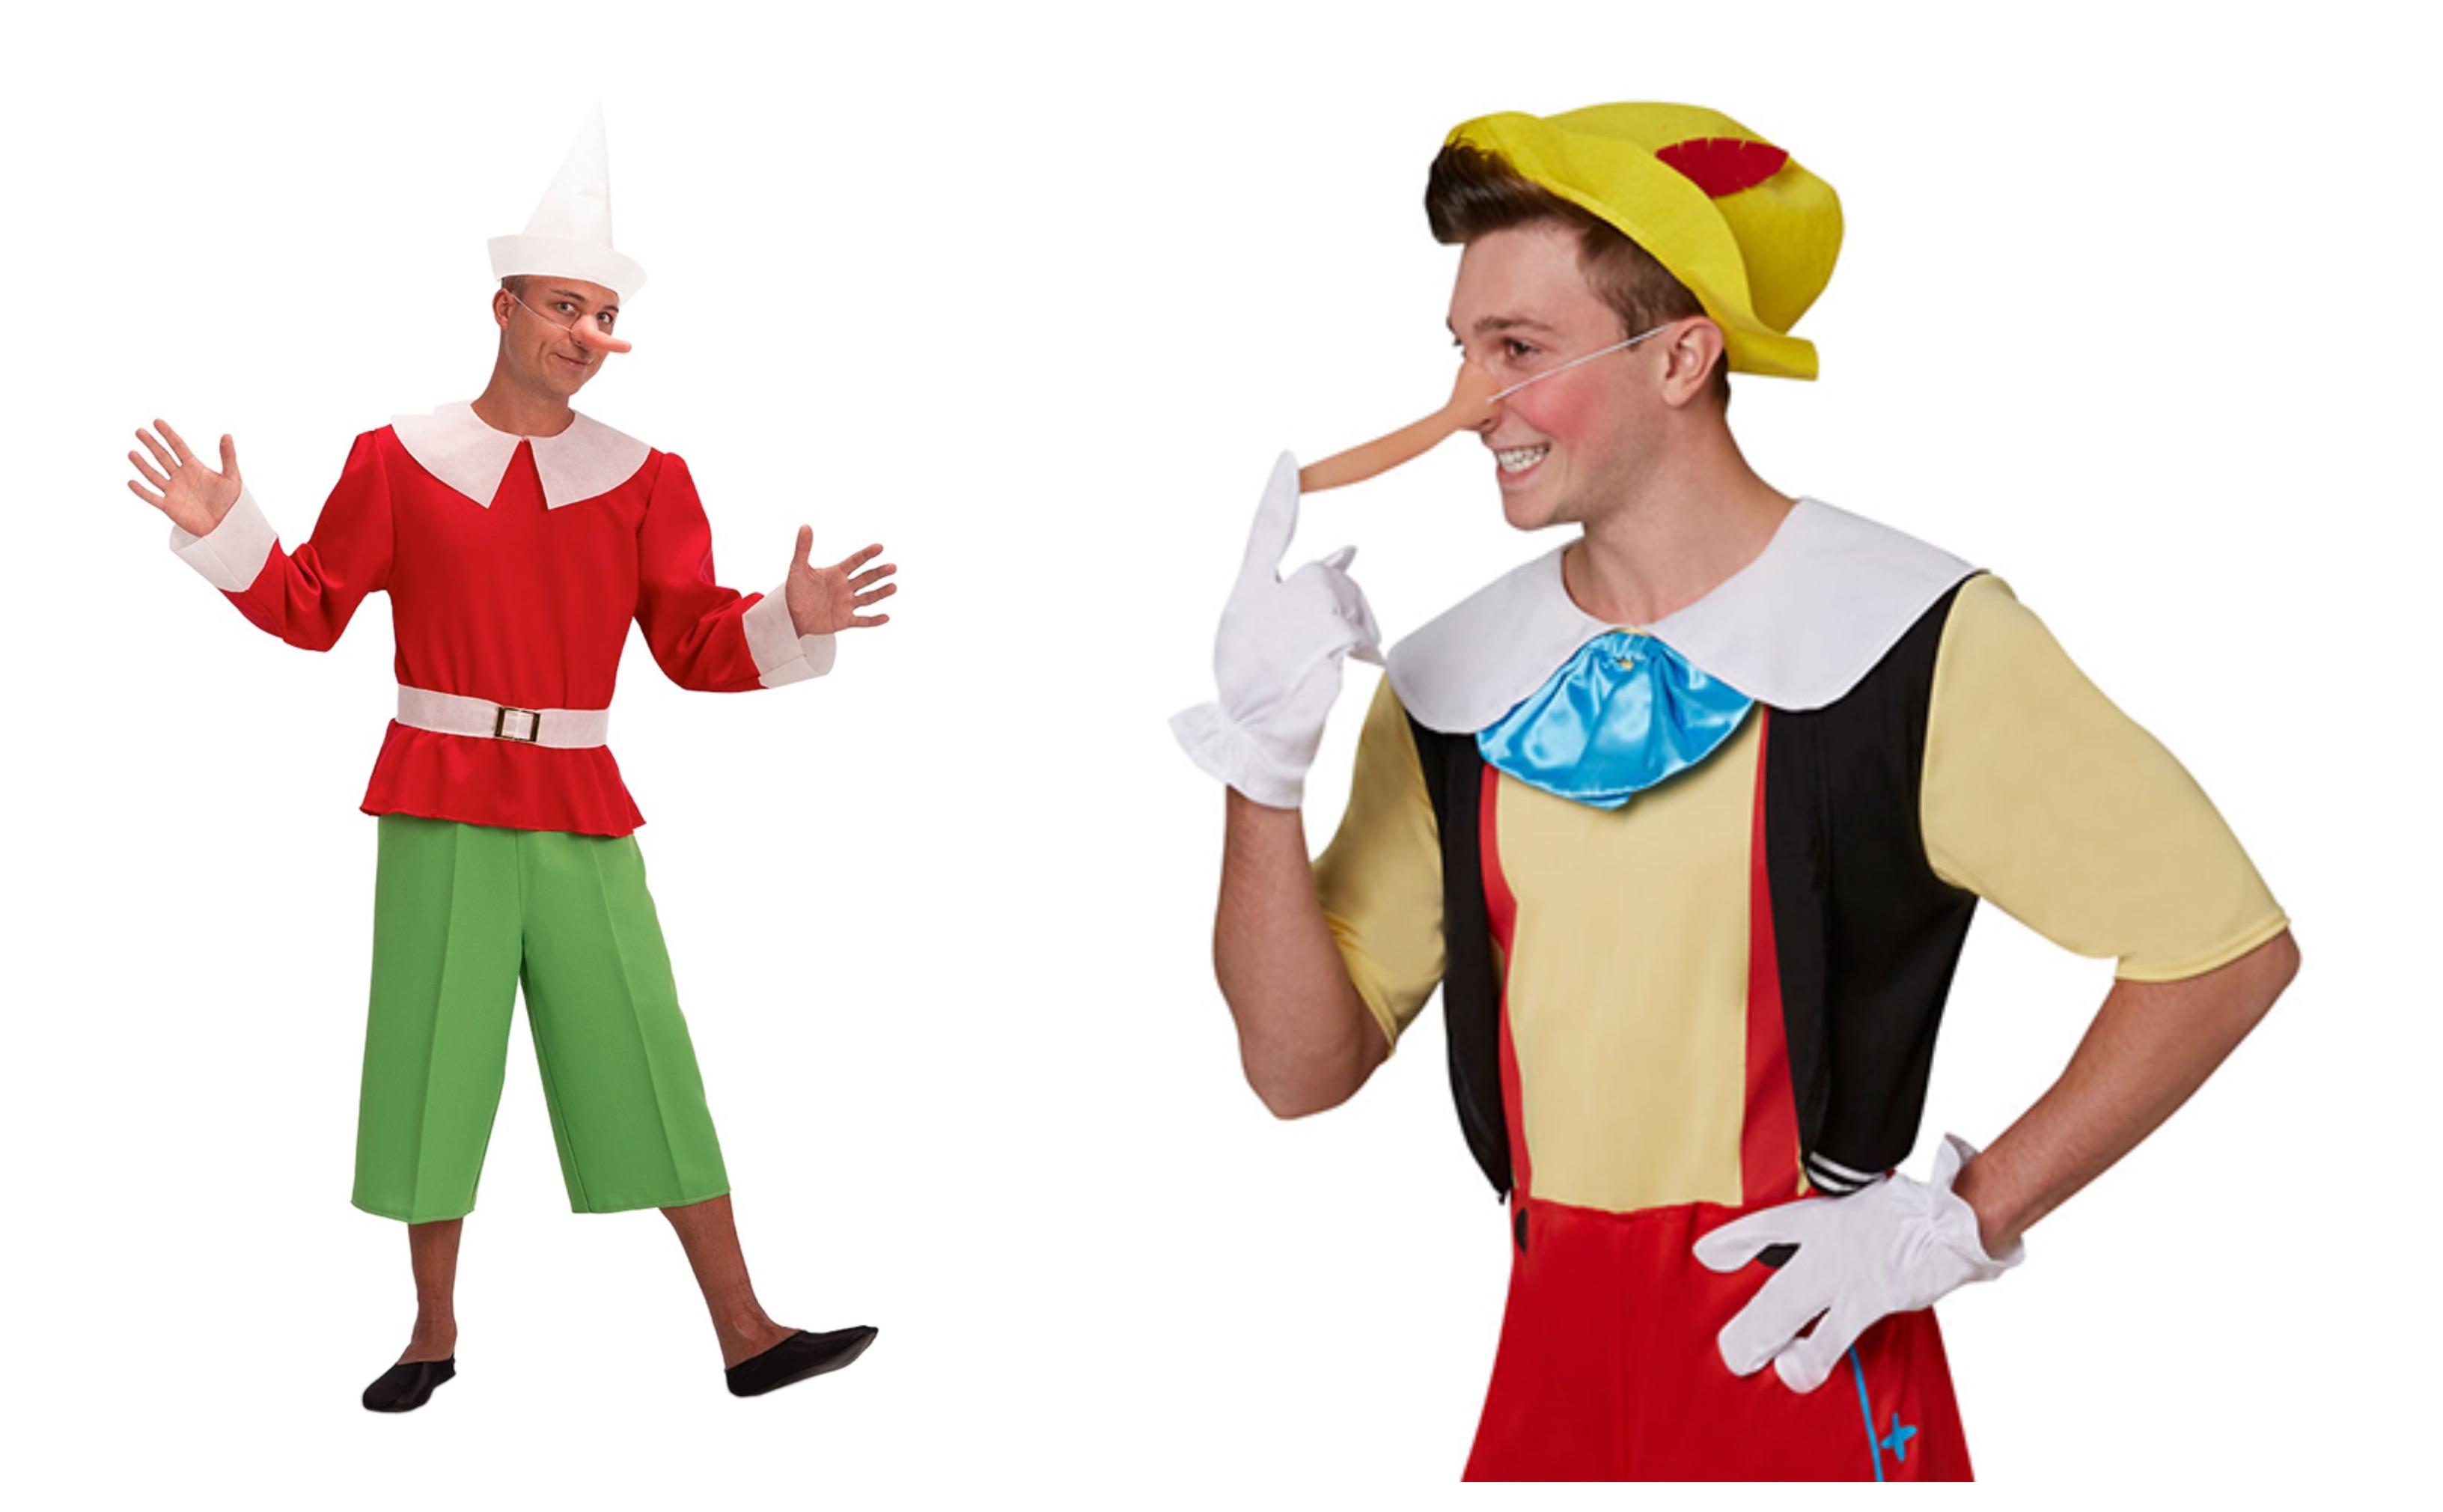 pinocchio kostume til voksne, pinocchio udklædning til voksne, pinocchio voksenkostumer, pinocchio kostumer, disney kostume til voksne, disney voksenkostumer, disney fastelavnskostume til voksne